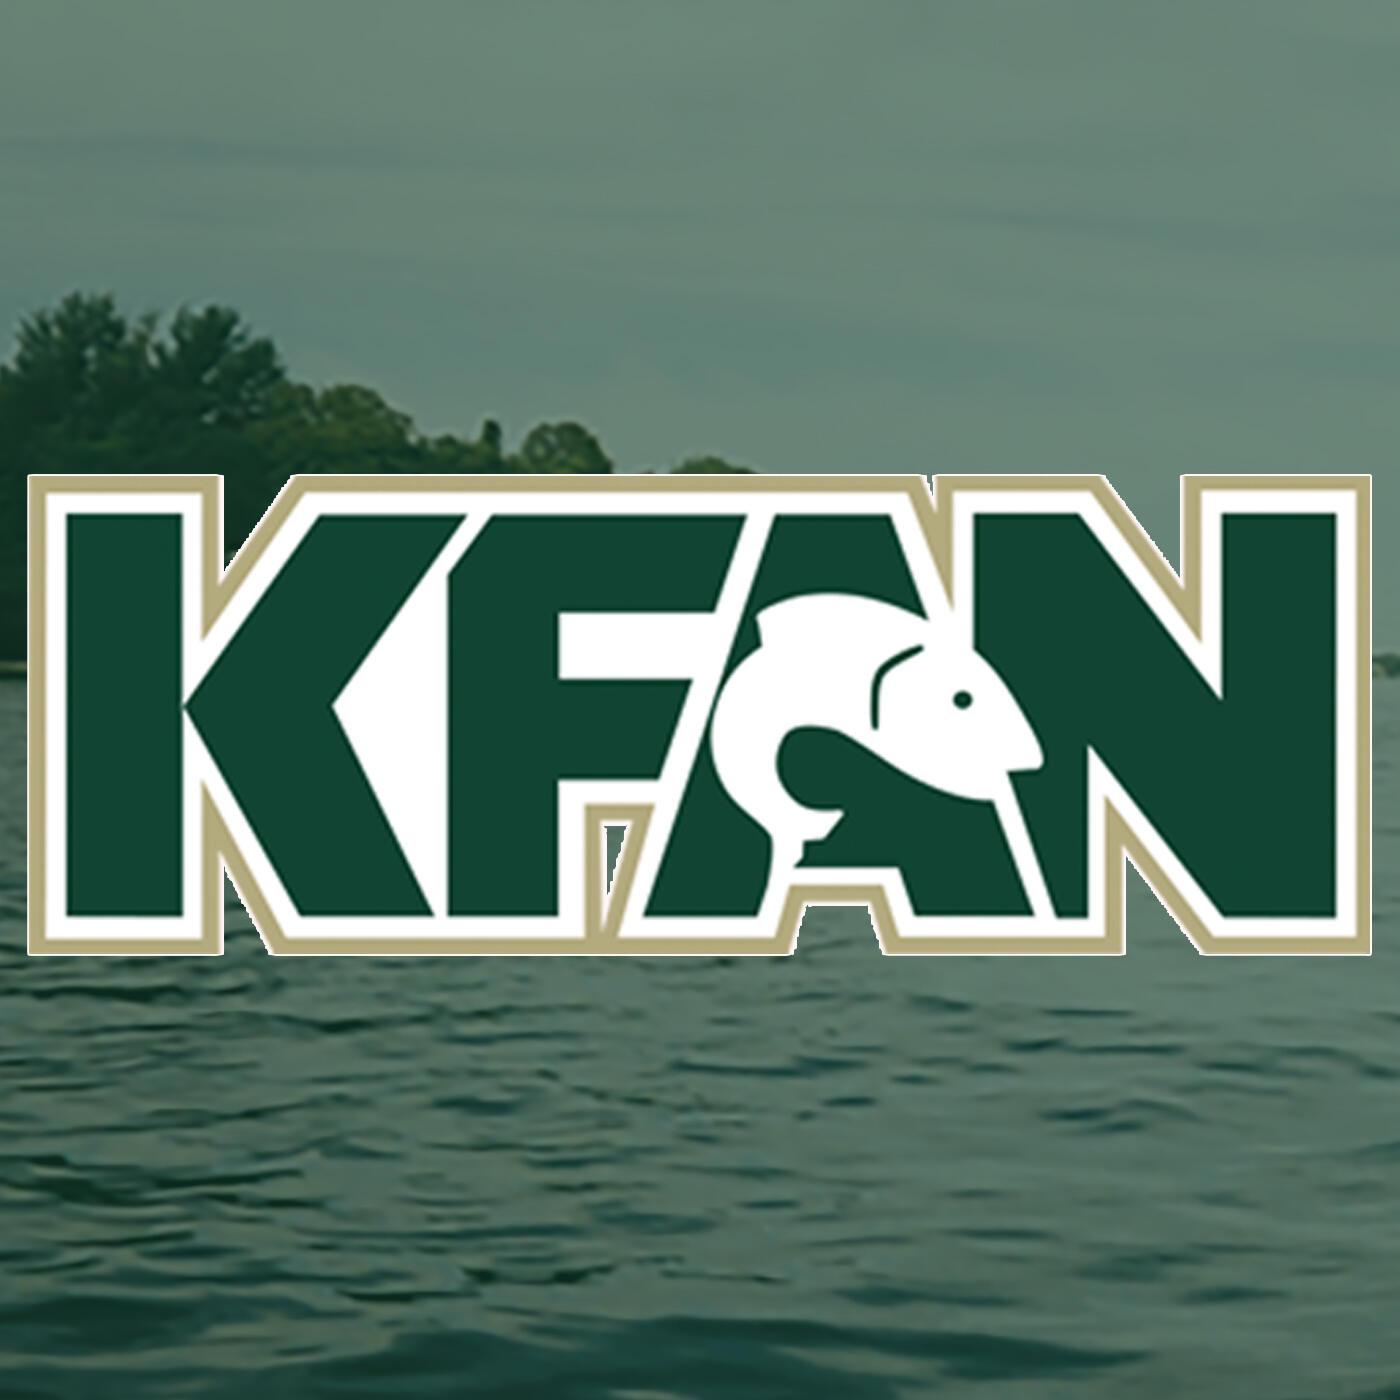 Listen to the KFAN Outdoors Episode - Thursday's Fan Outdoors on iHeartRadio | iHeartRadio